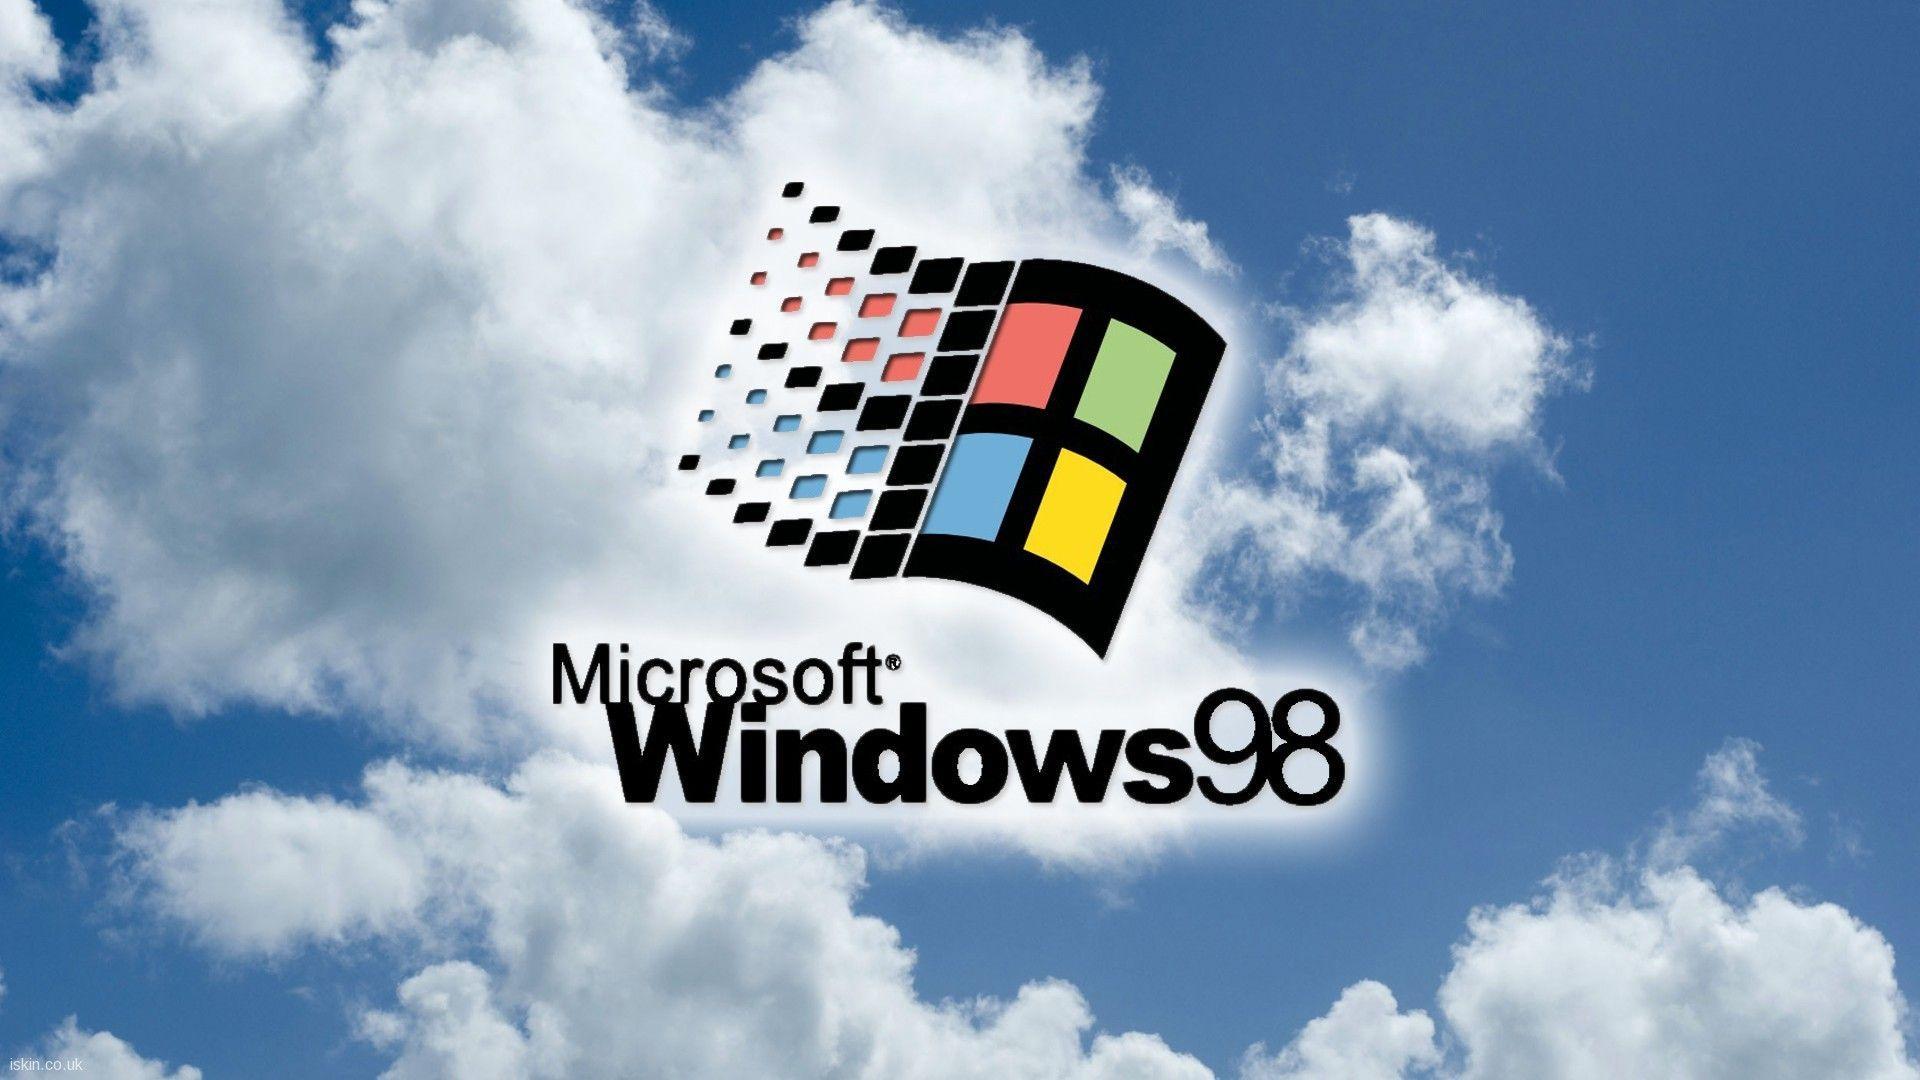 Windows 98 Backgrounds Wallpaper Cave